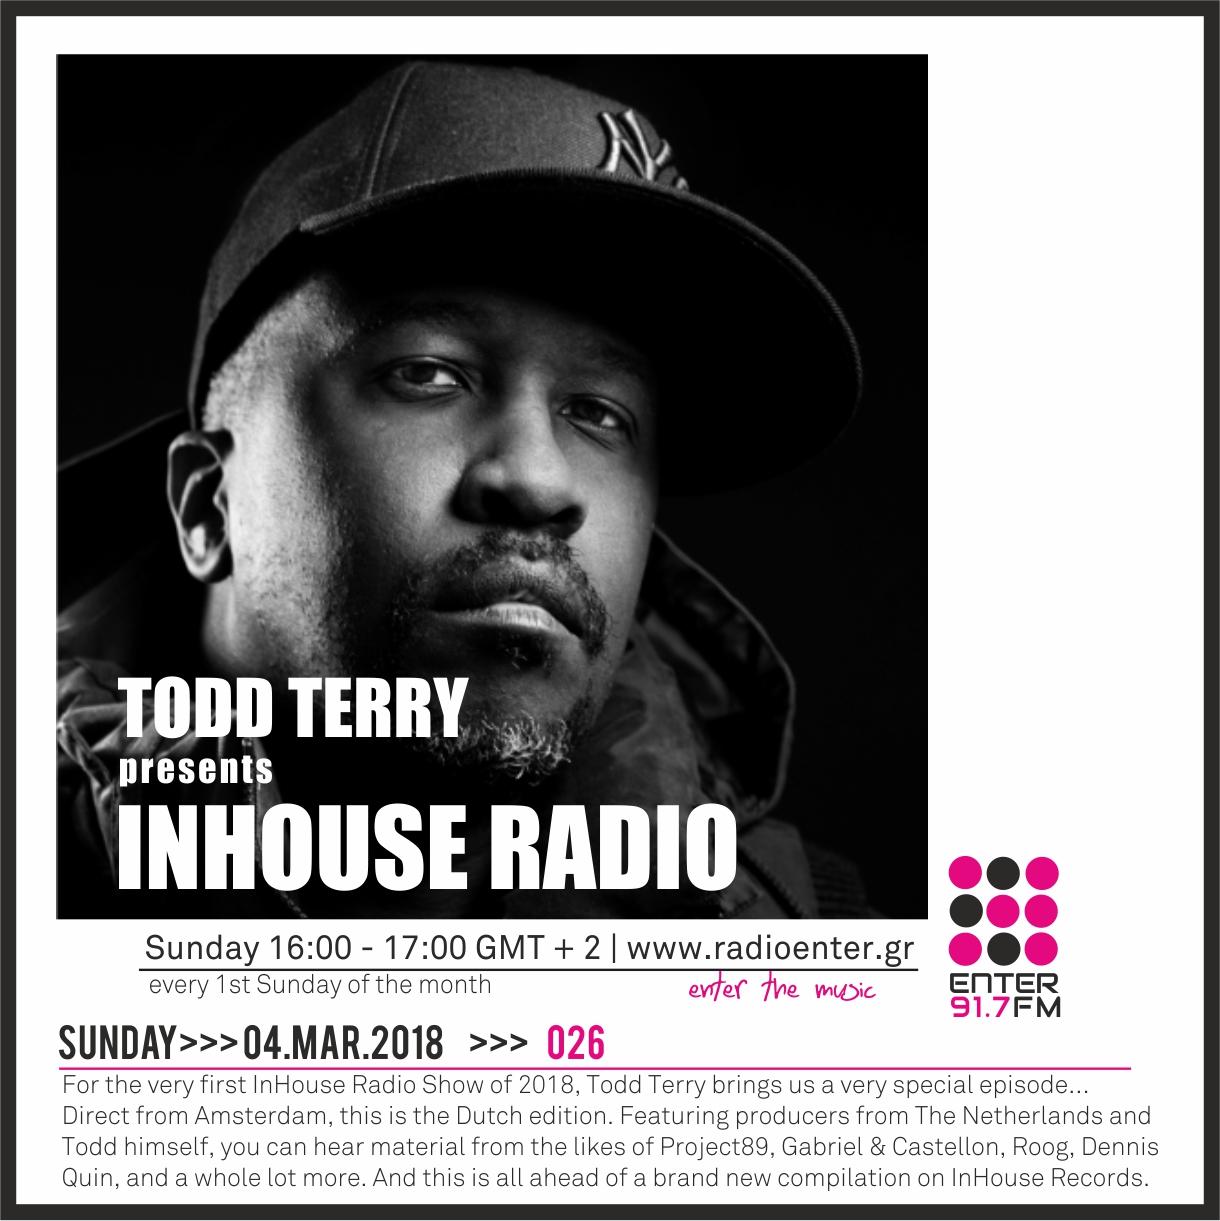 2018.03.04 - Todd Terry 'InHouse Radio' 026